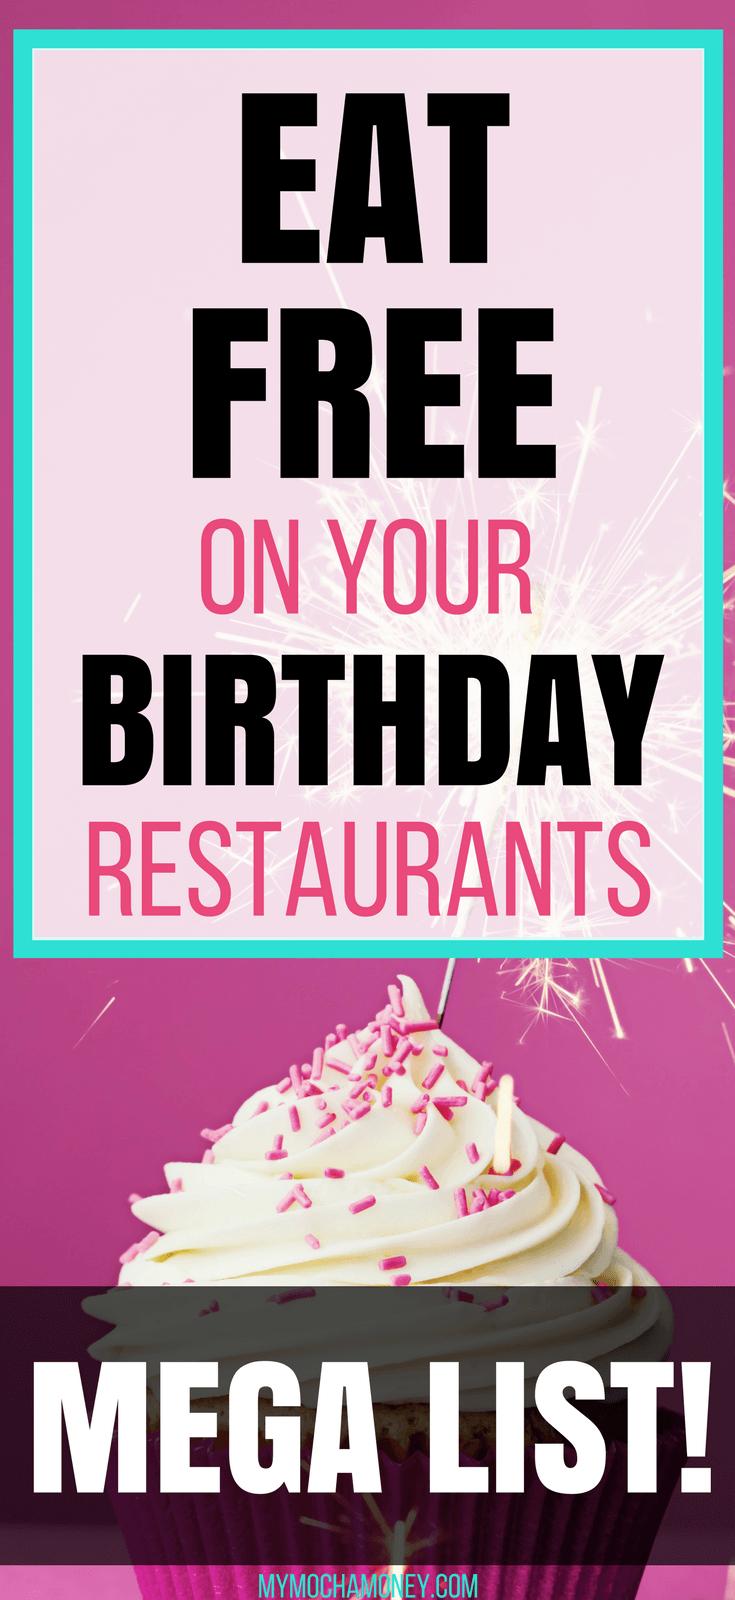 Eat Free On Your Birthday Free birthday food, Free